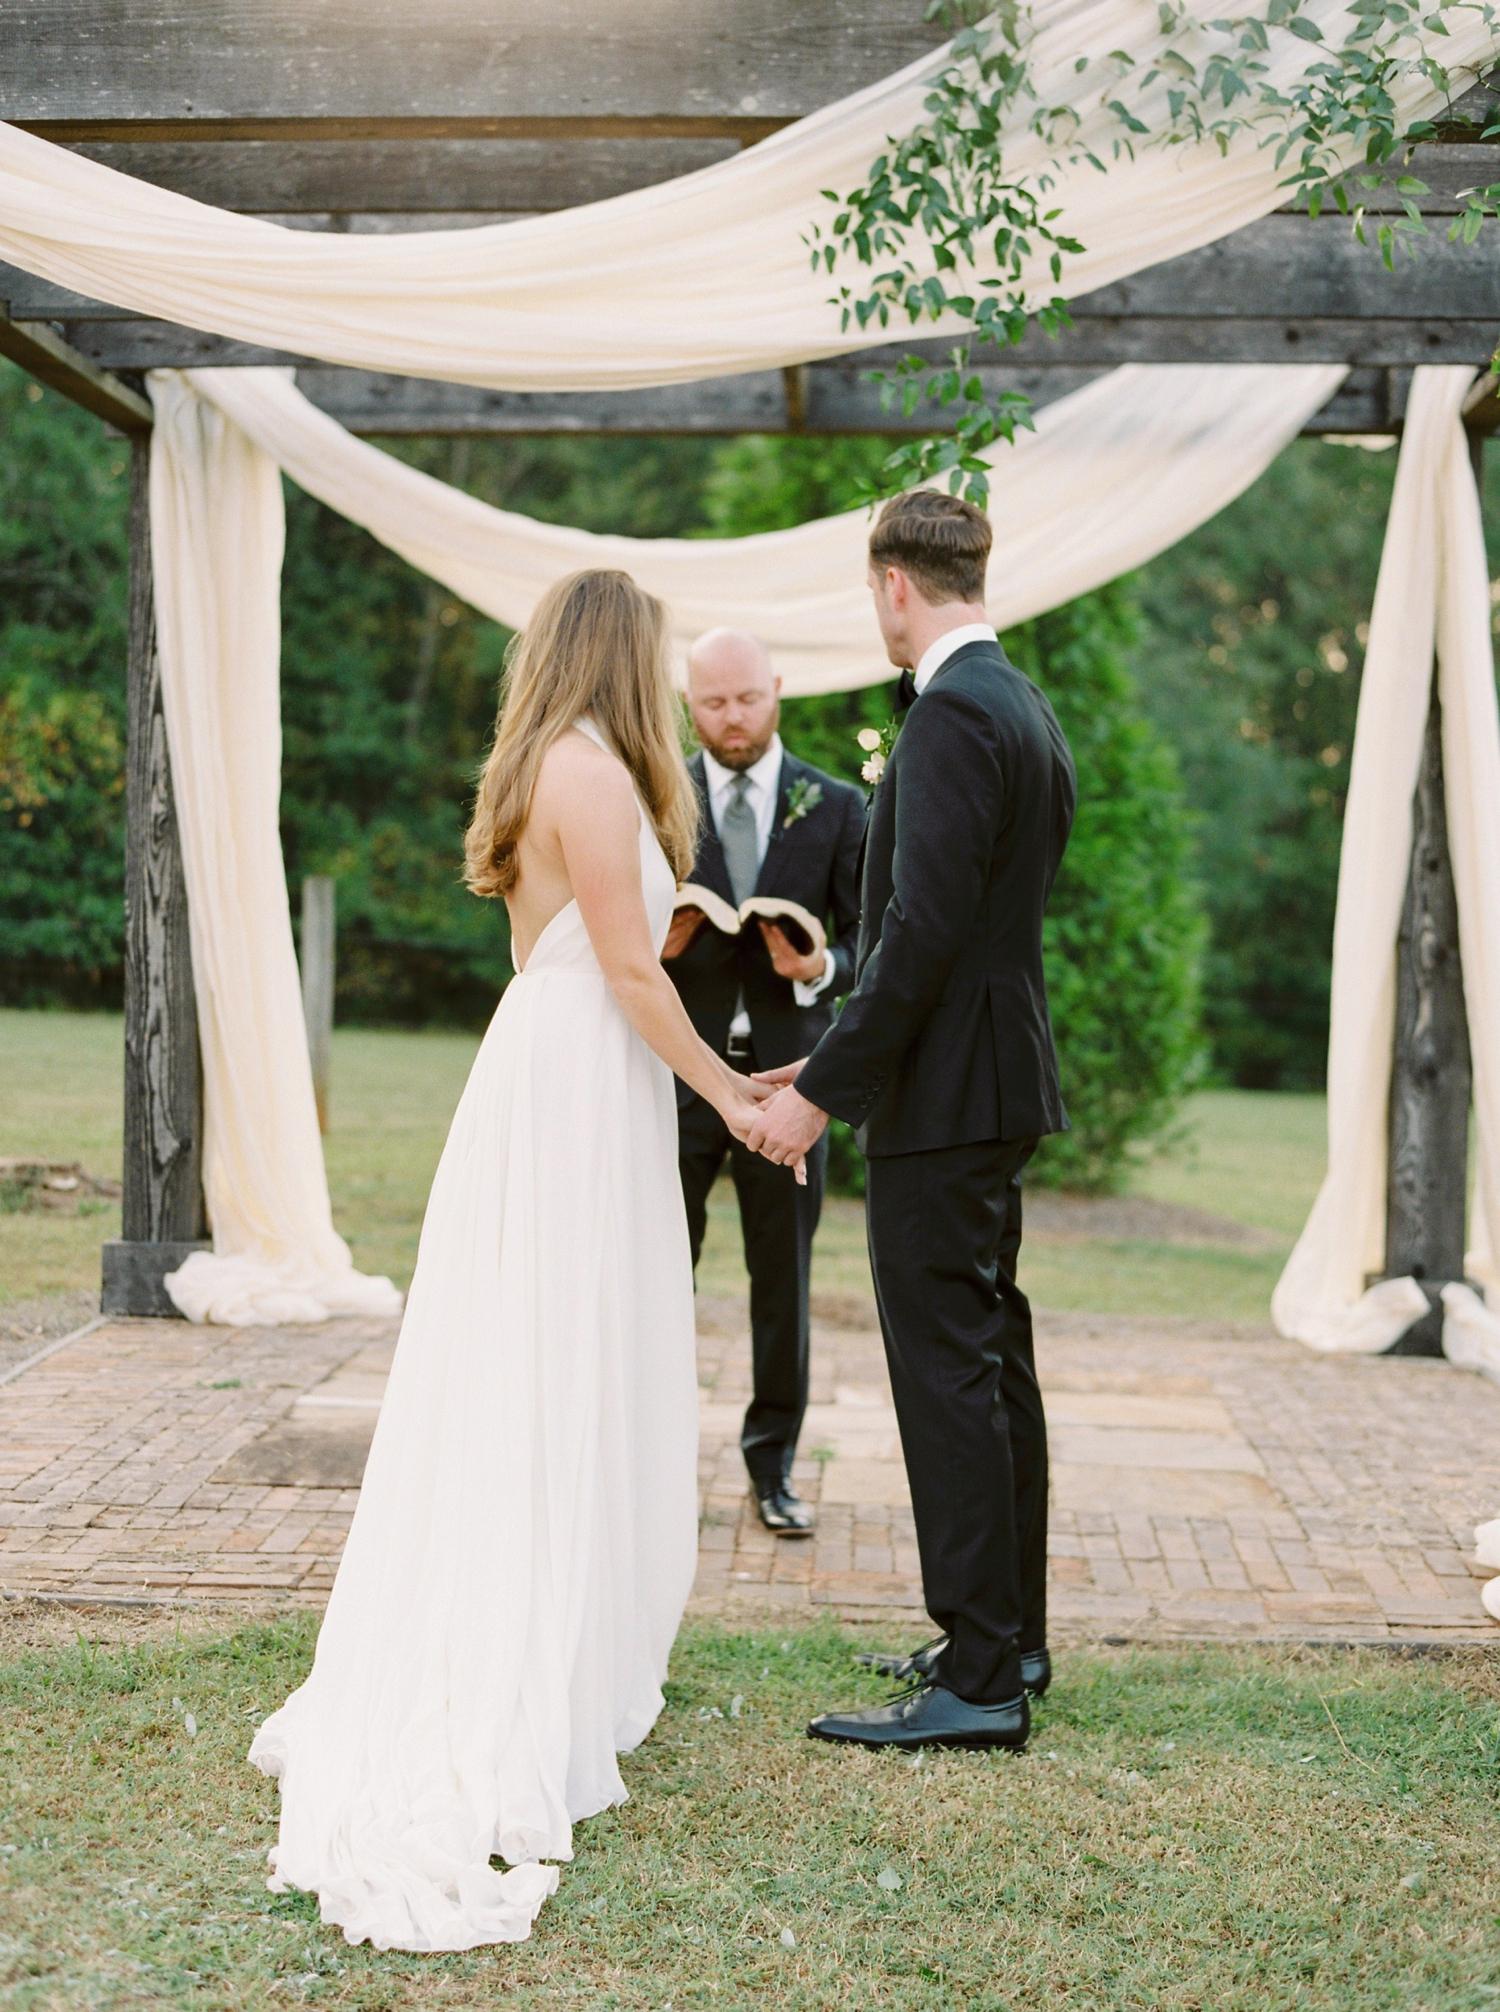 Calgary wedding photographers | georgia wedding photographers | fine art film | Justine Milton Photography | georgia wedding | wedding ceremony | groomsmen